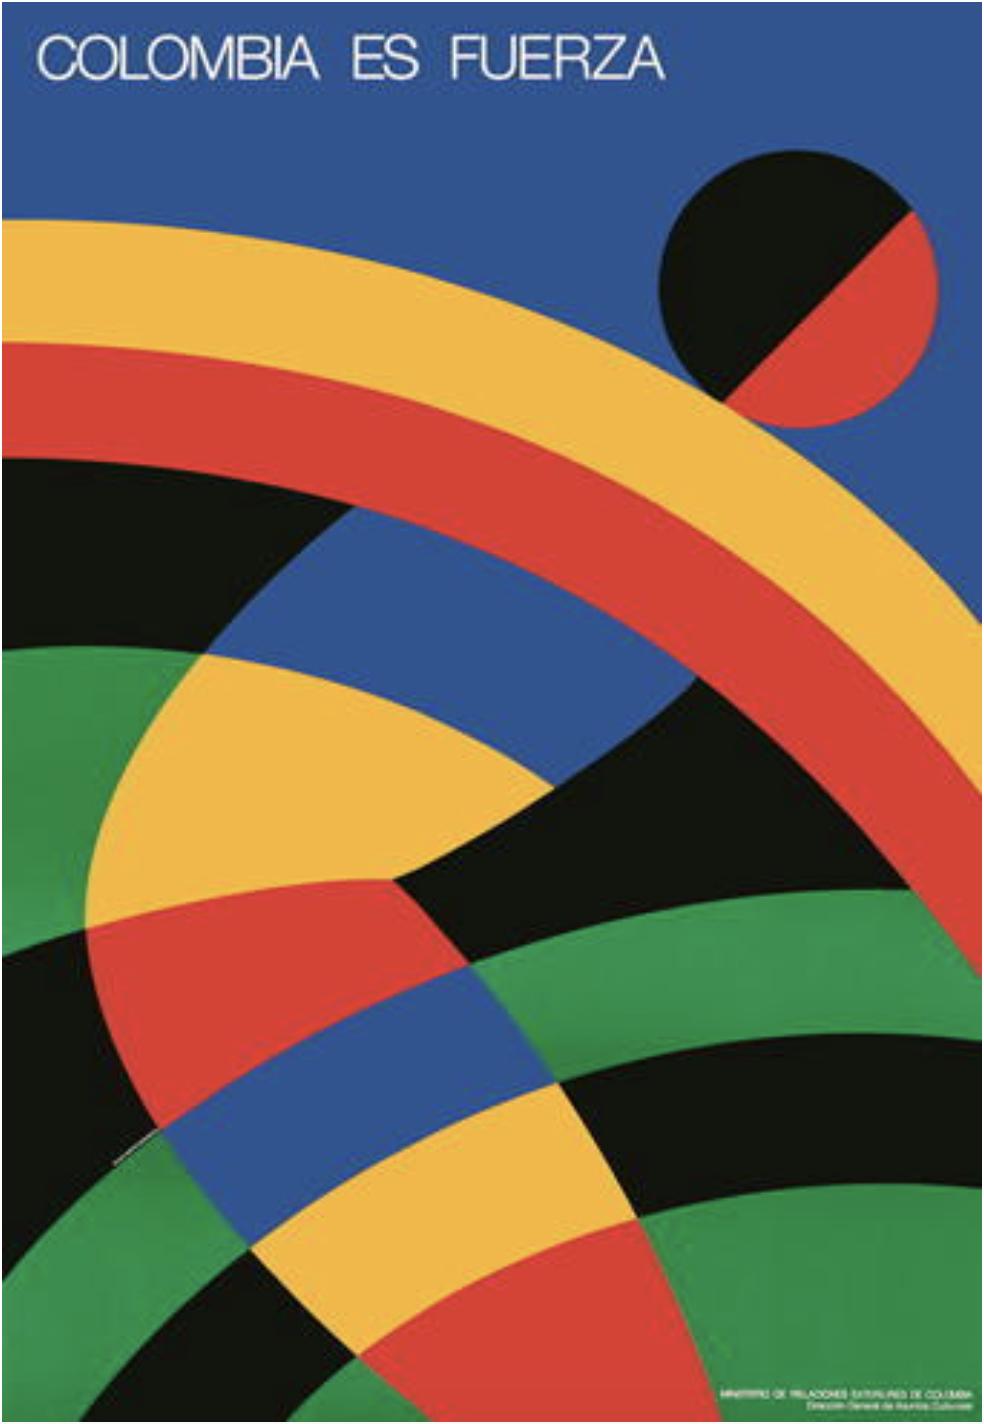 ew york branding sports graphic design company